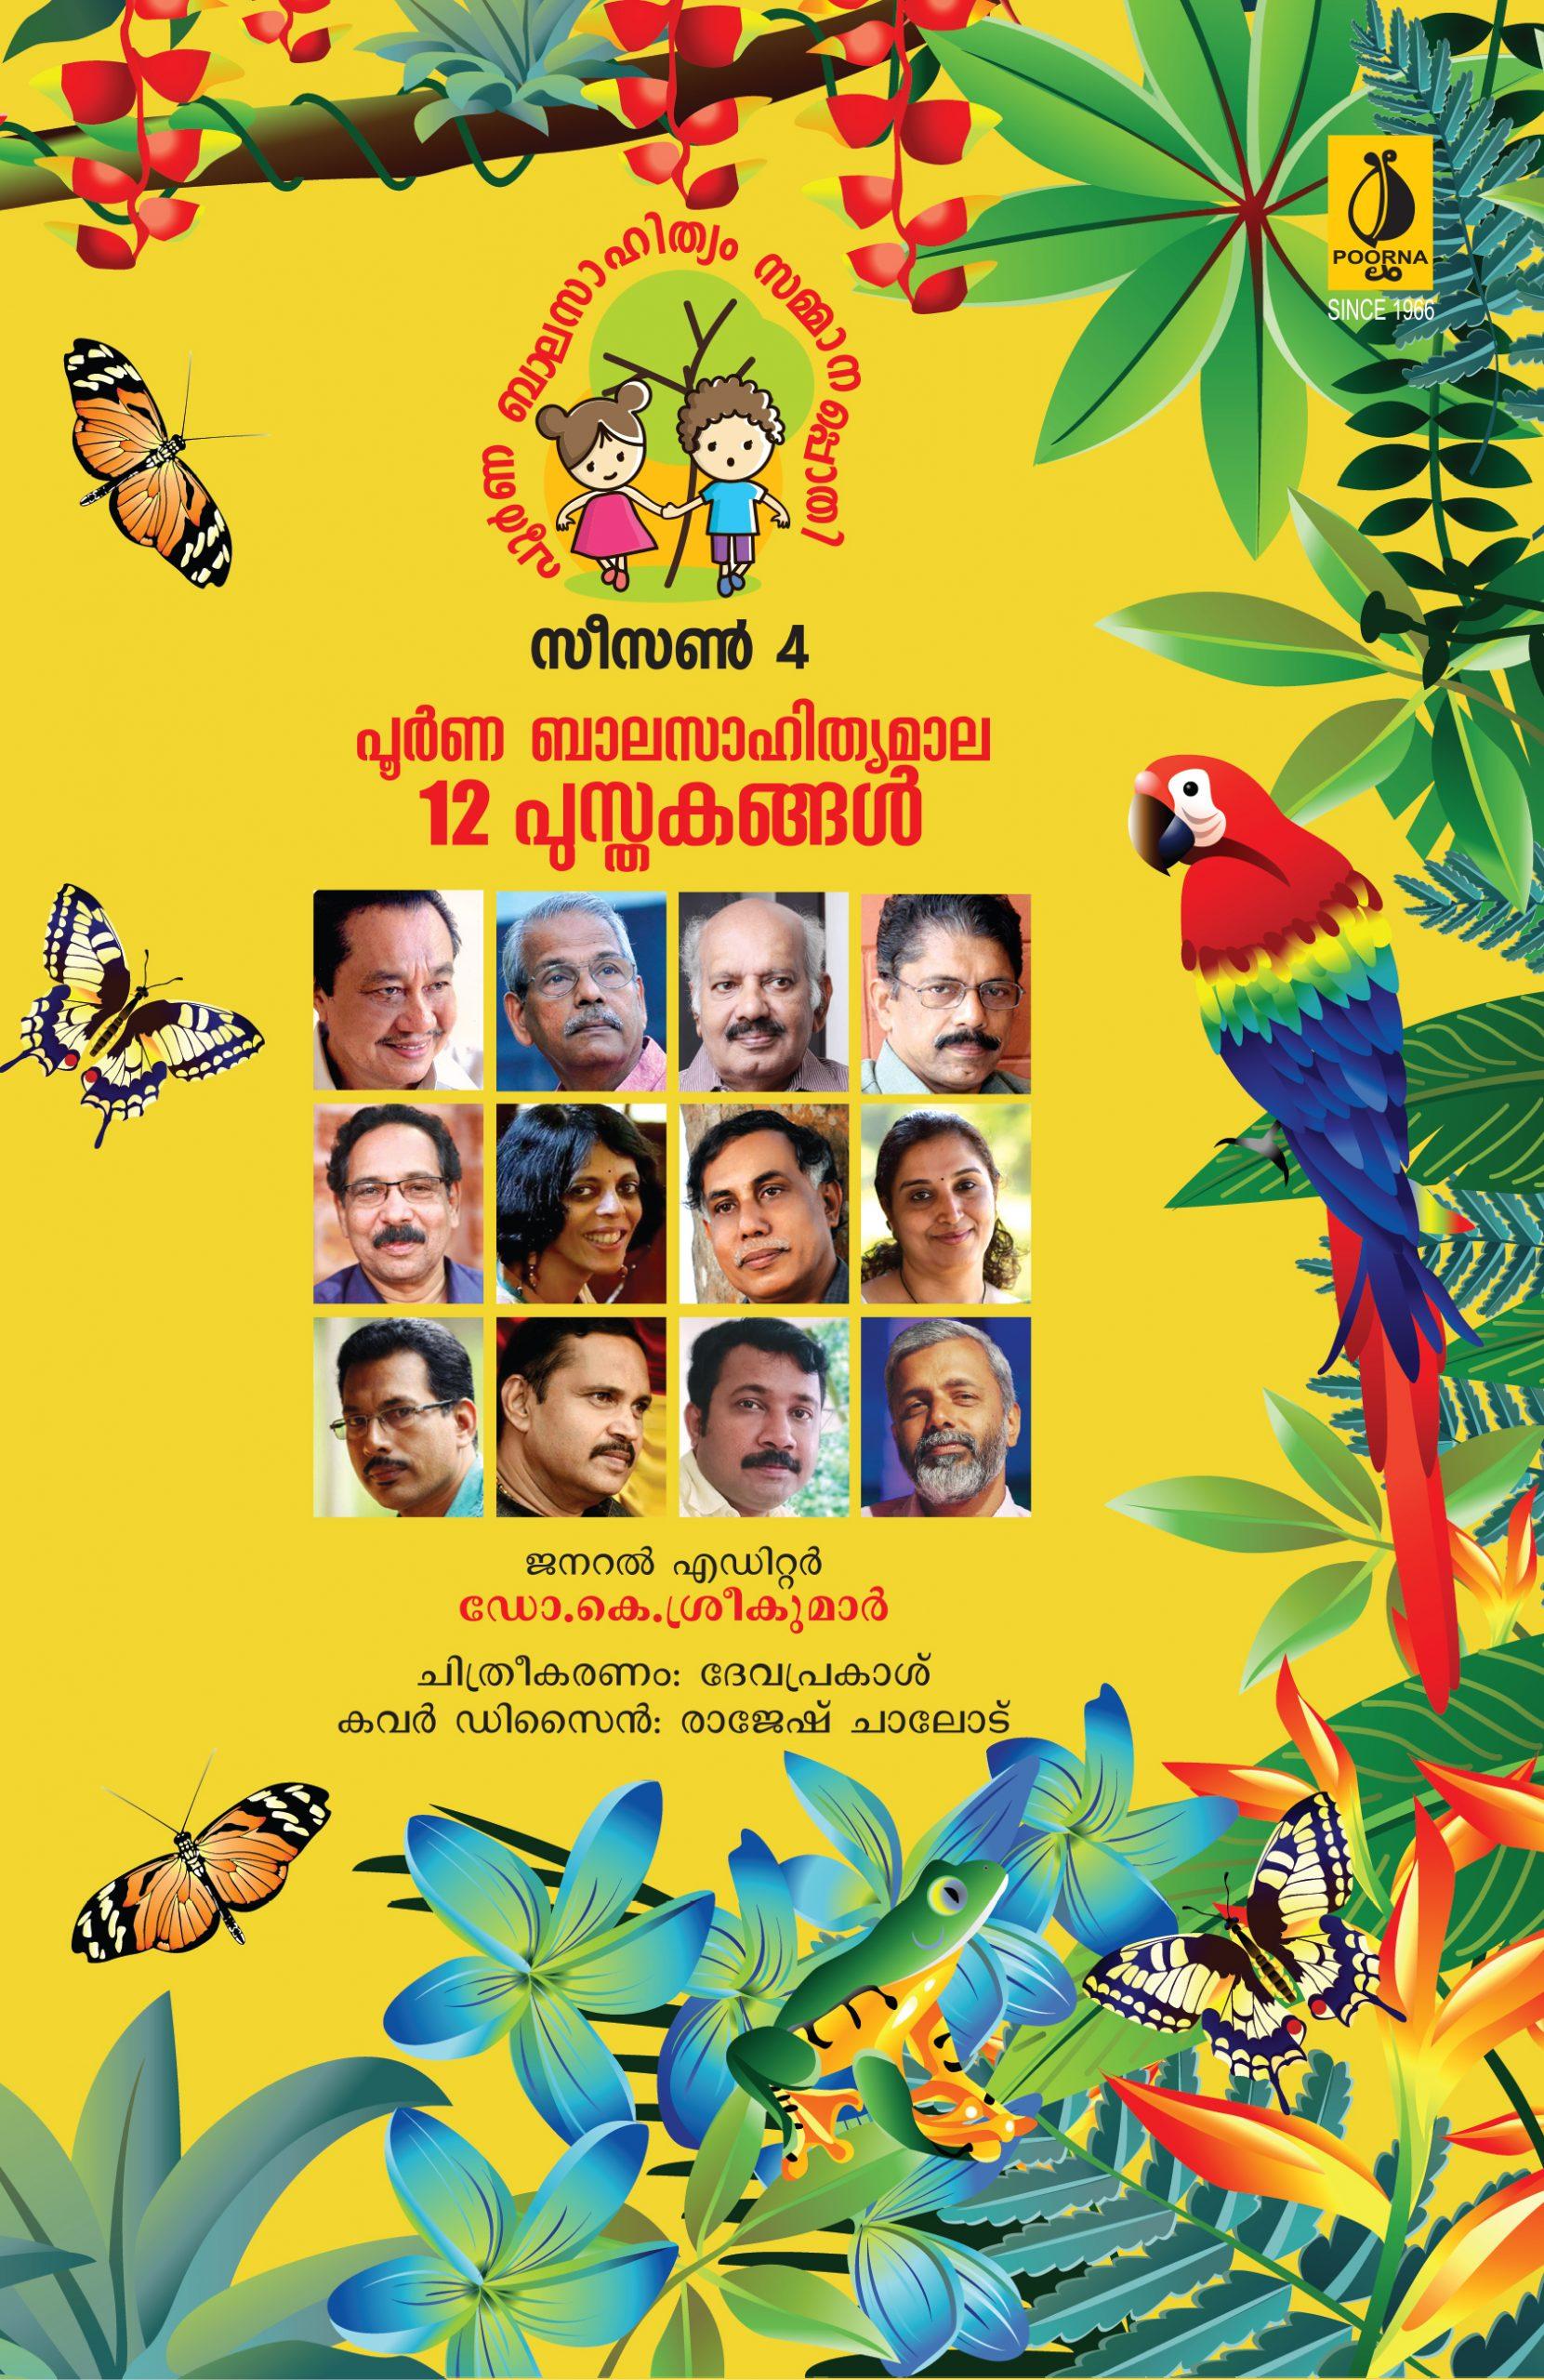 Poorna Balasahithyamala Sammanappothi : Season 4